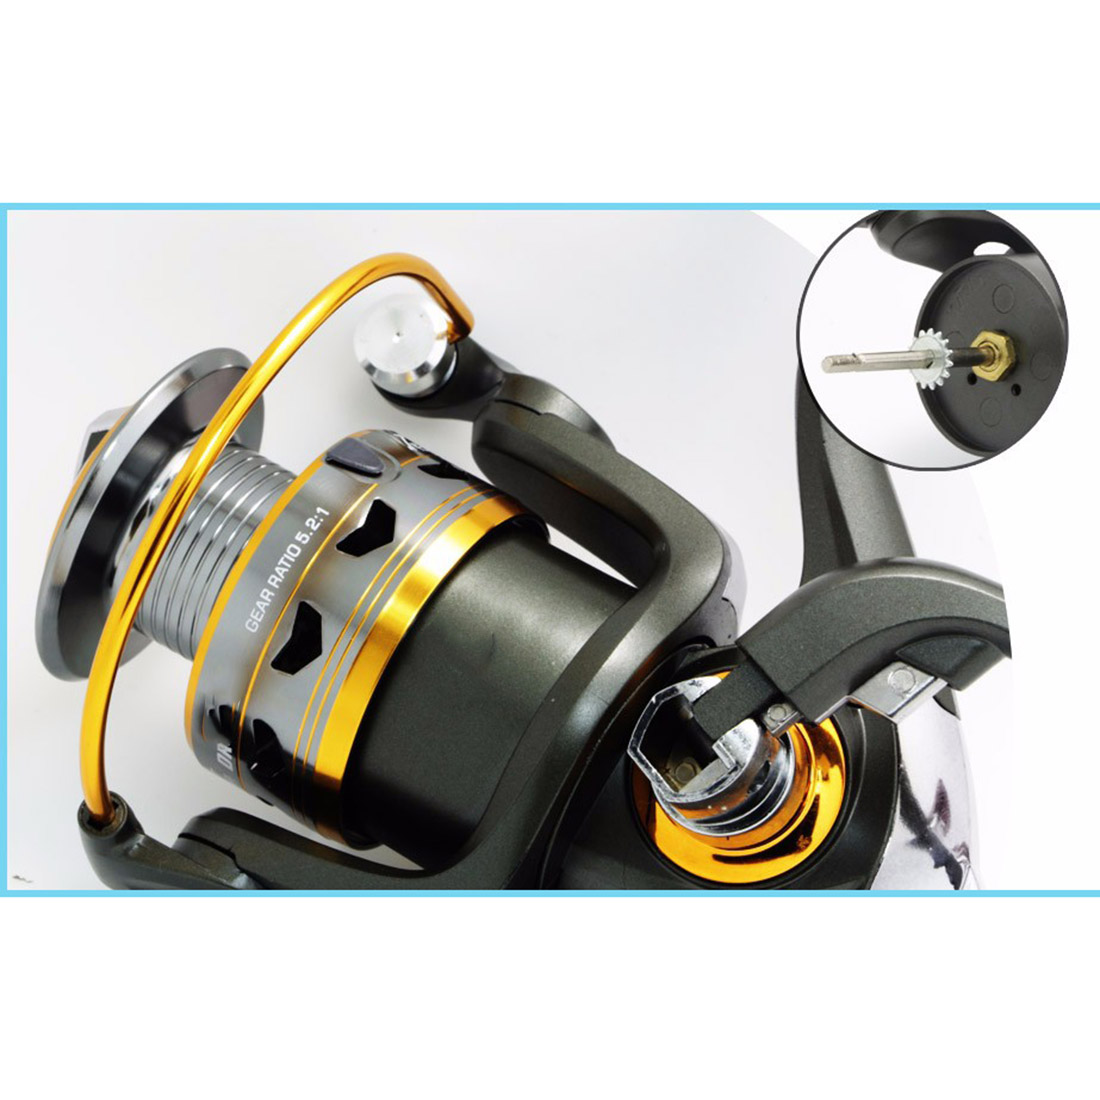 Fishing German Technology Fishing Reel 11BB 2000-6000 Series Spinning Reel For Feeder Fishing